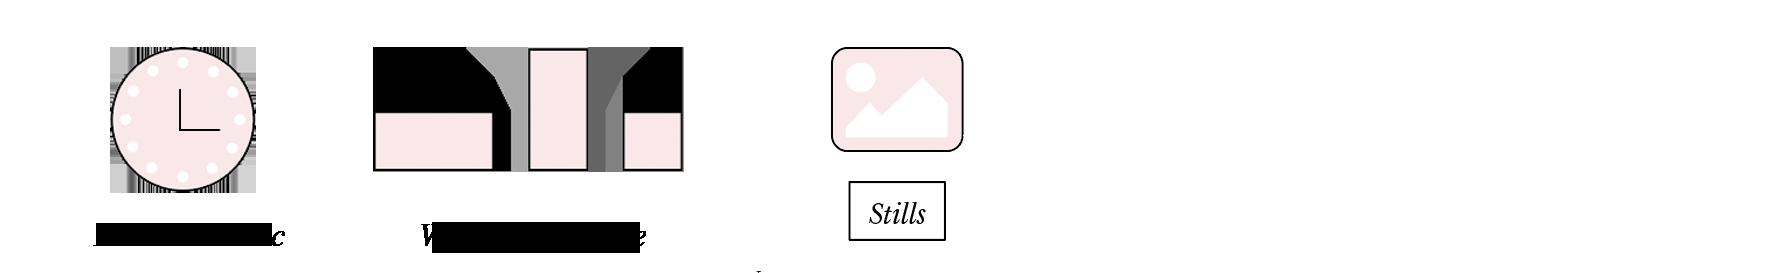 kmart symbol